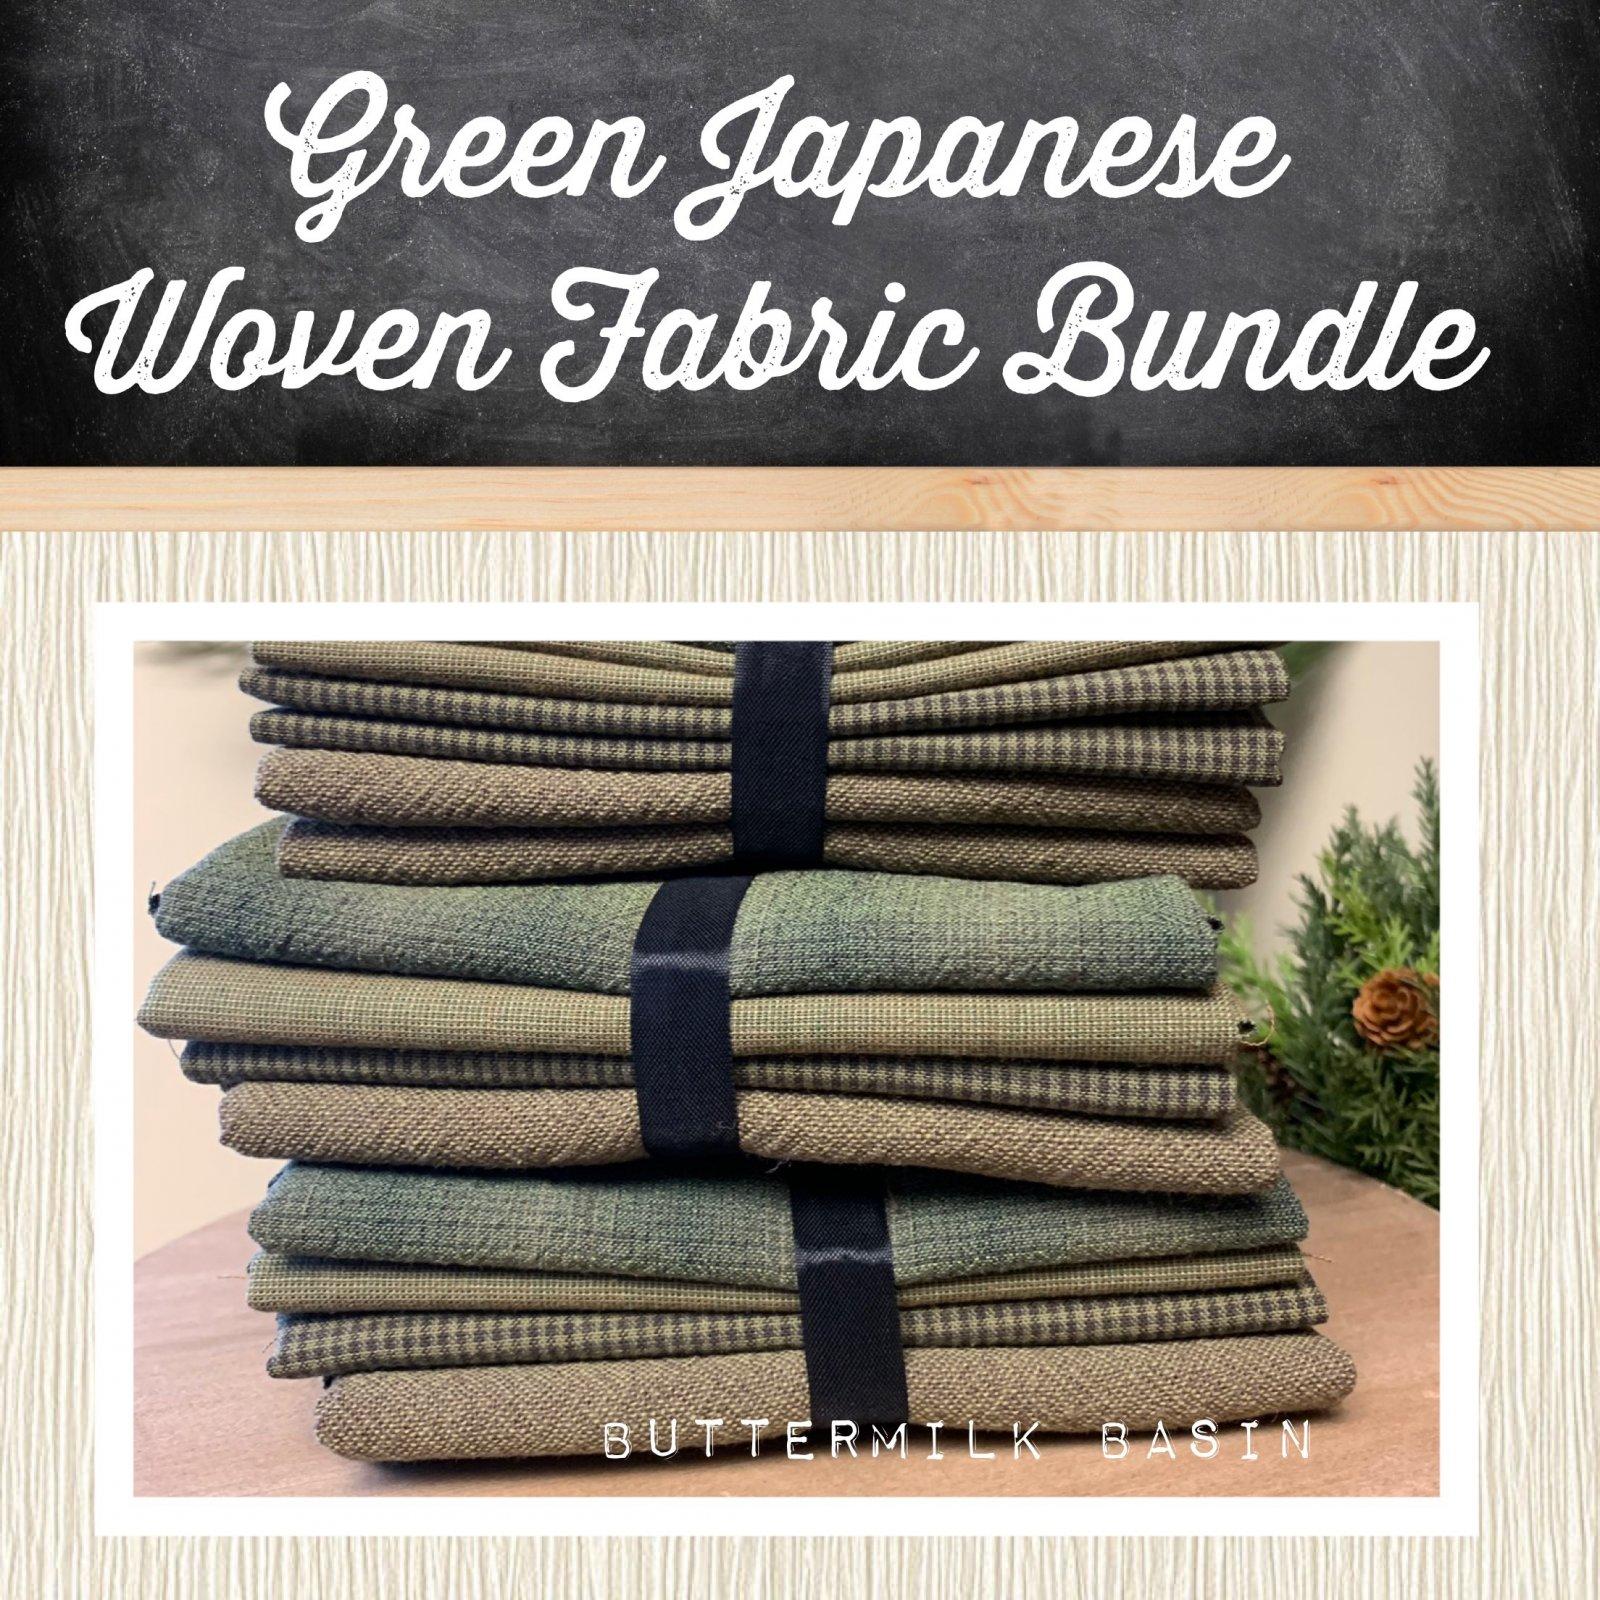 Green Japanese Woven Fabric Bundle